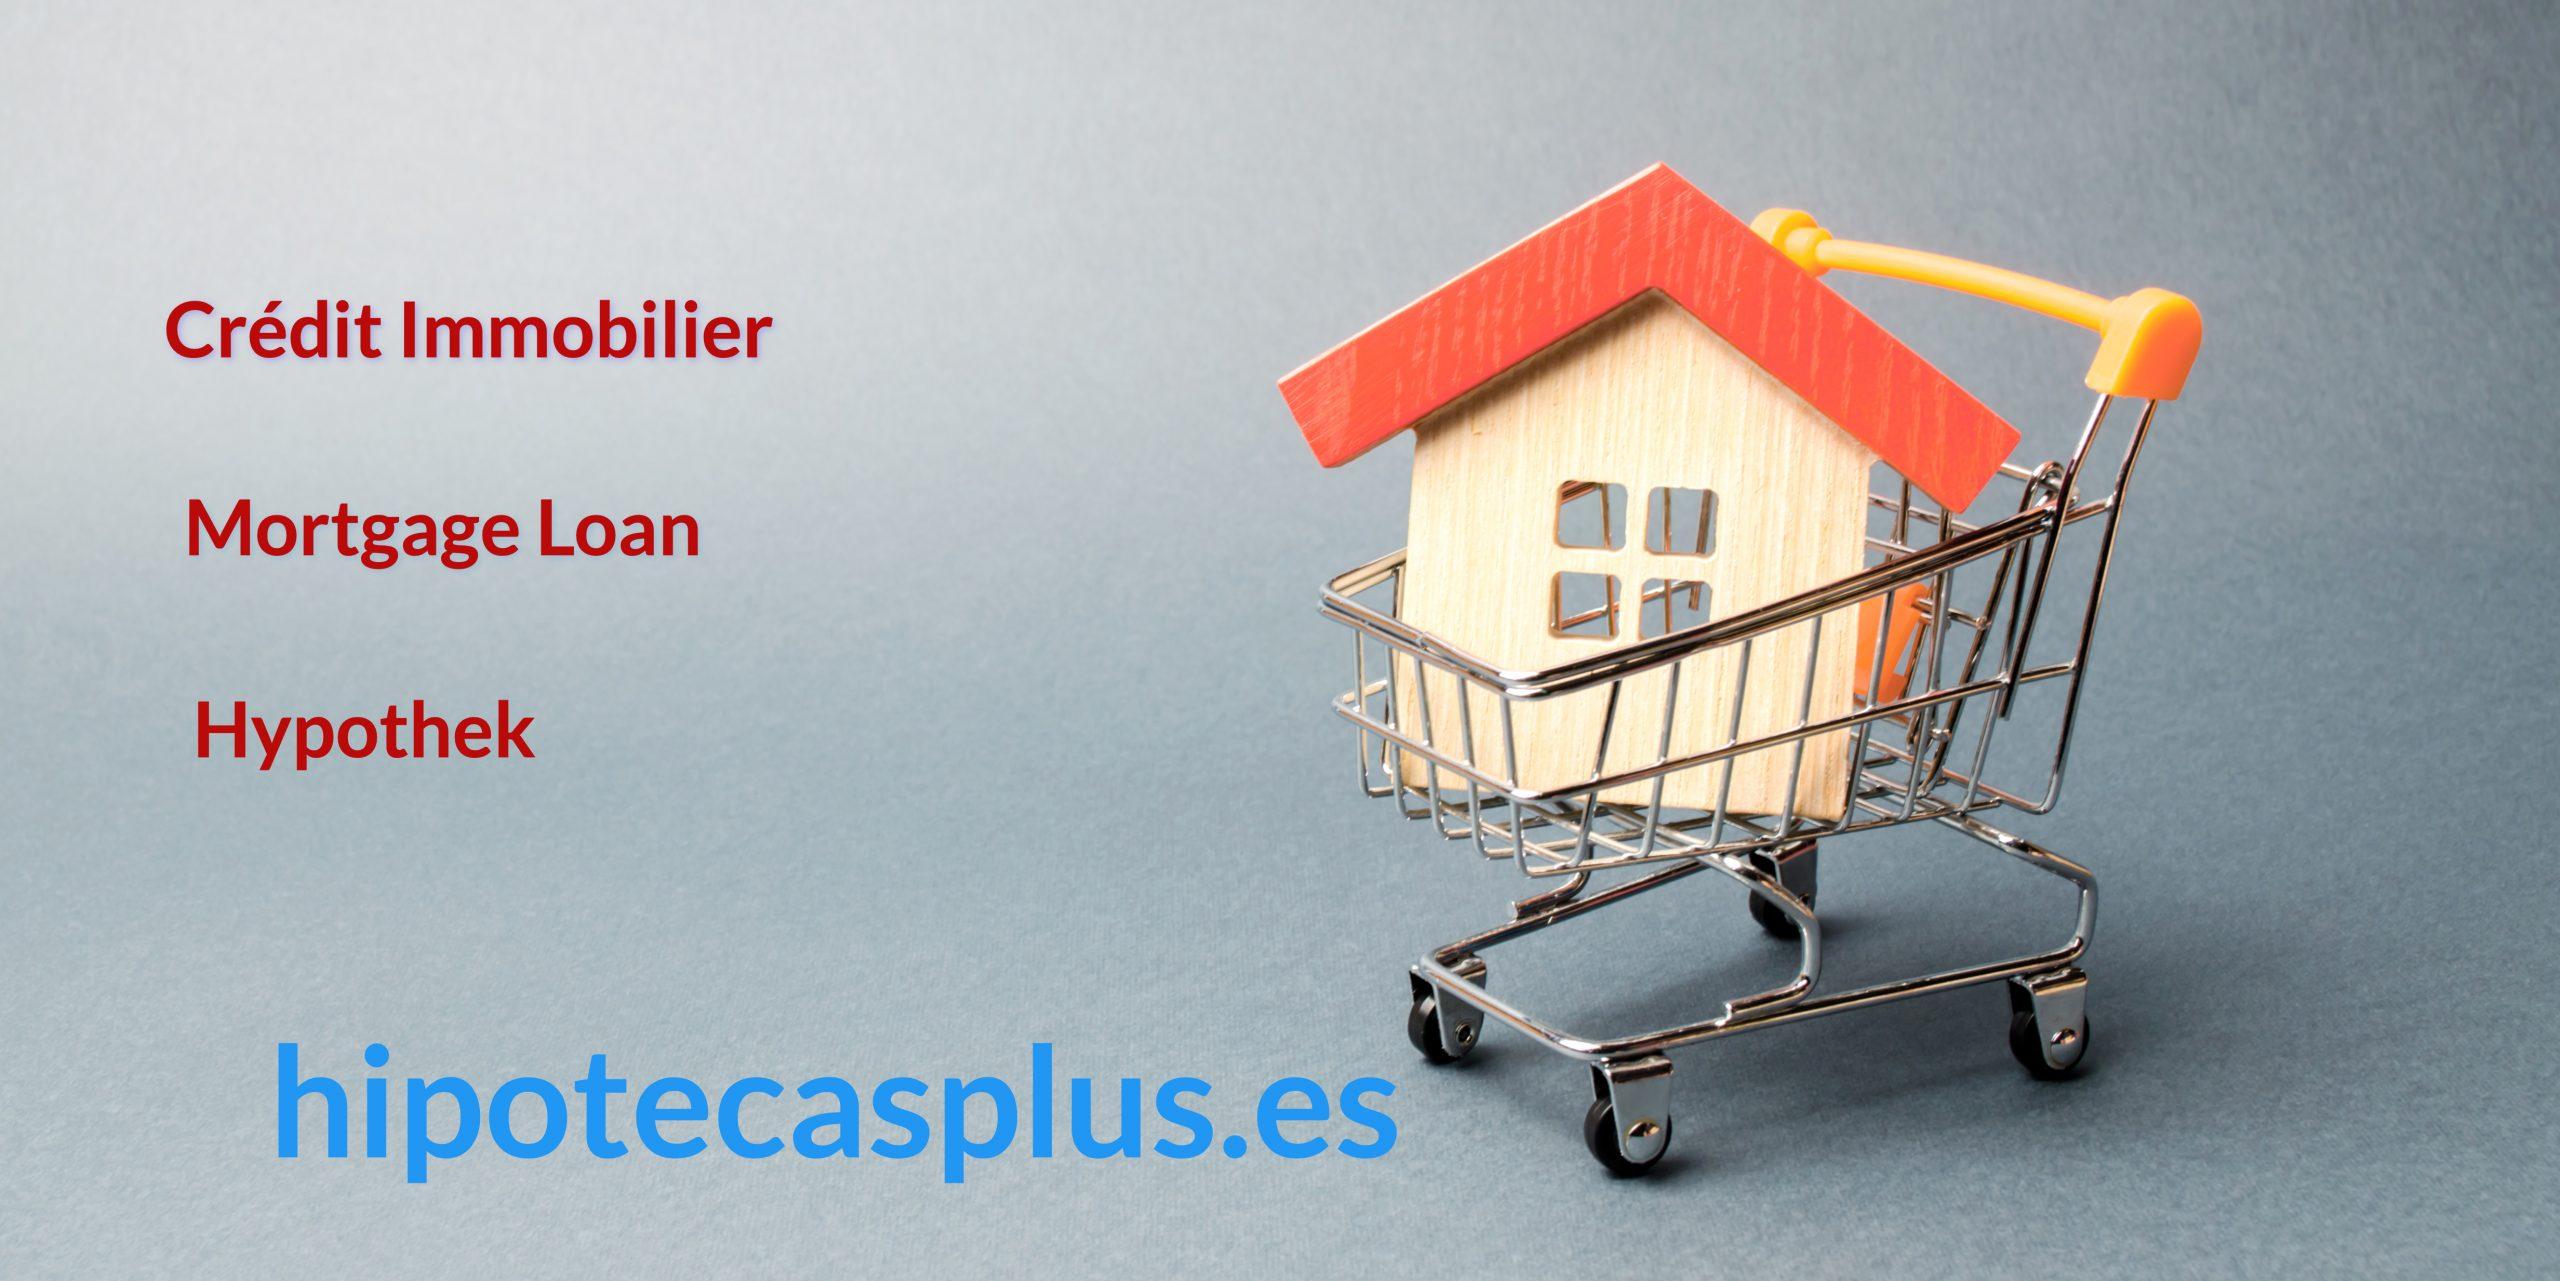 Hipoteca per a no residents: claus i qüestions